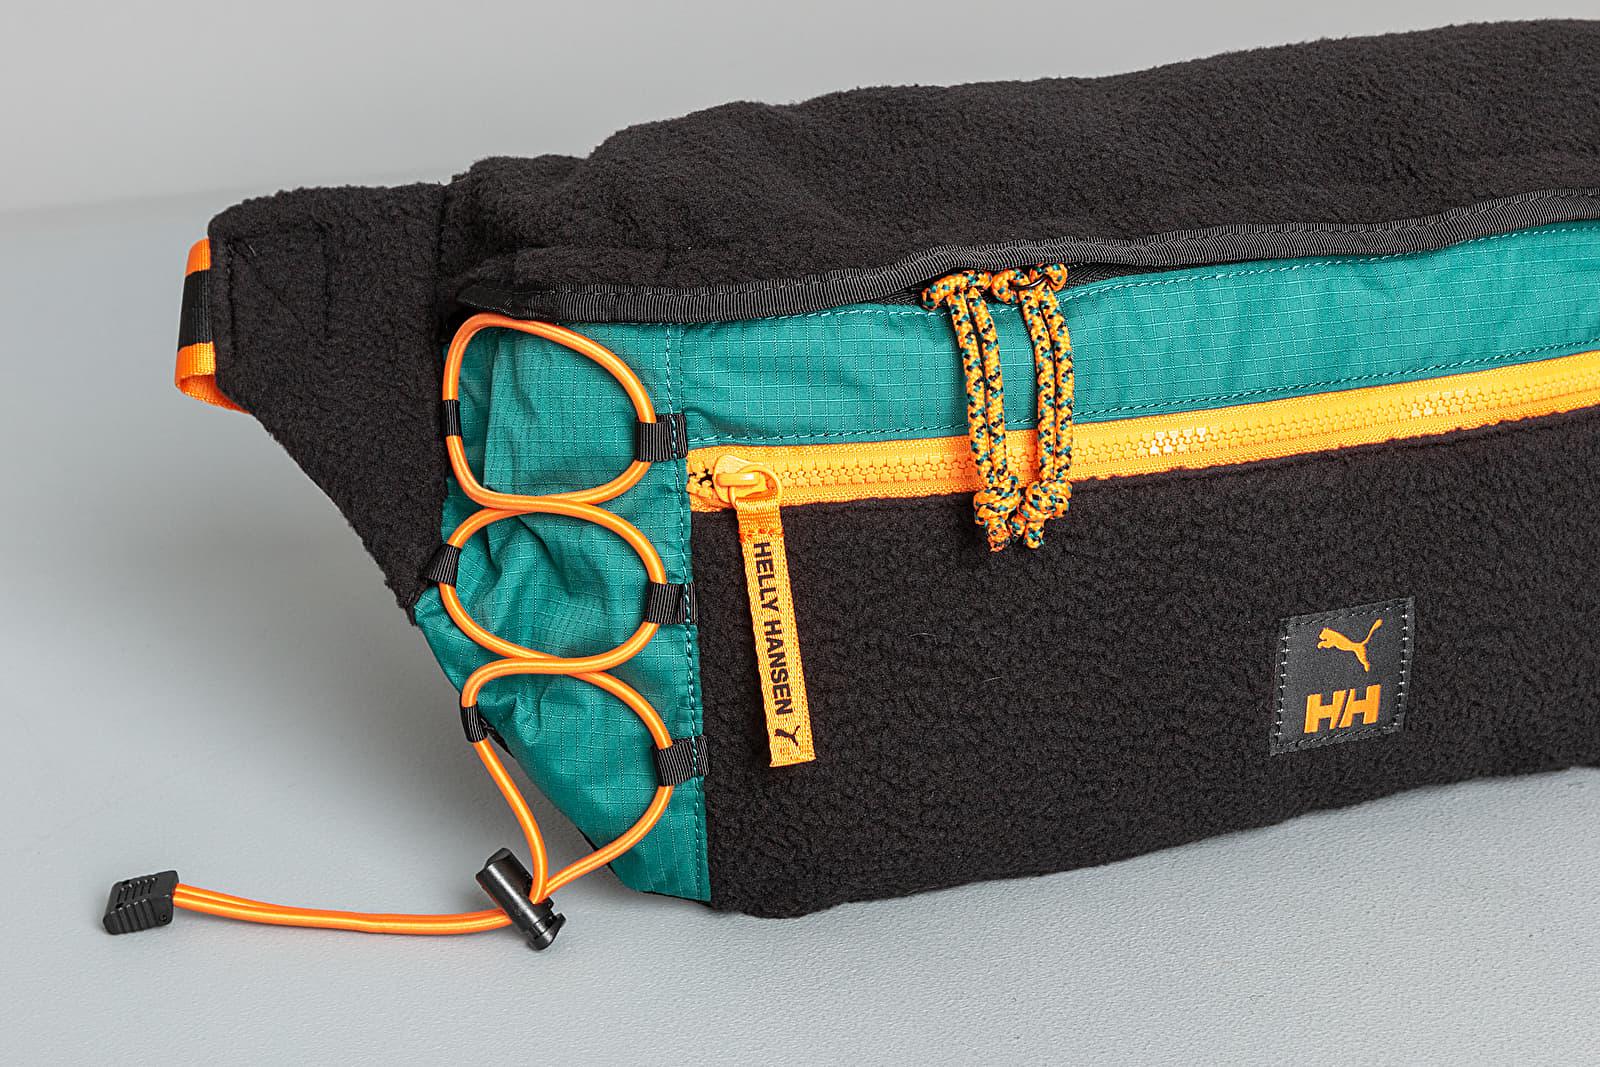 Puma x Helly Hansen Oversized Waistbag Black/ Teal Green | Footshop